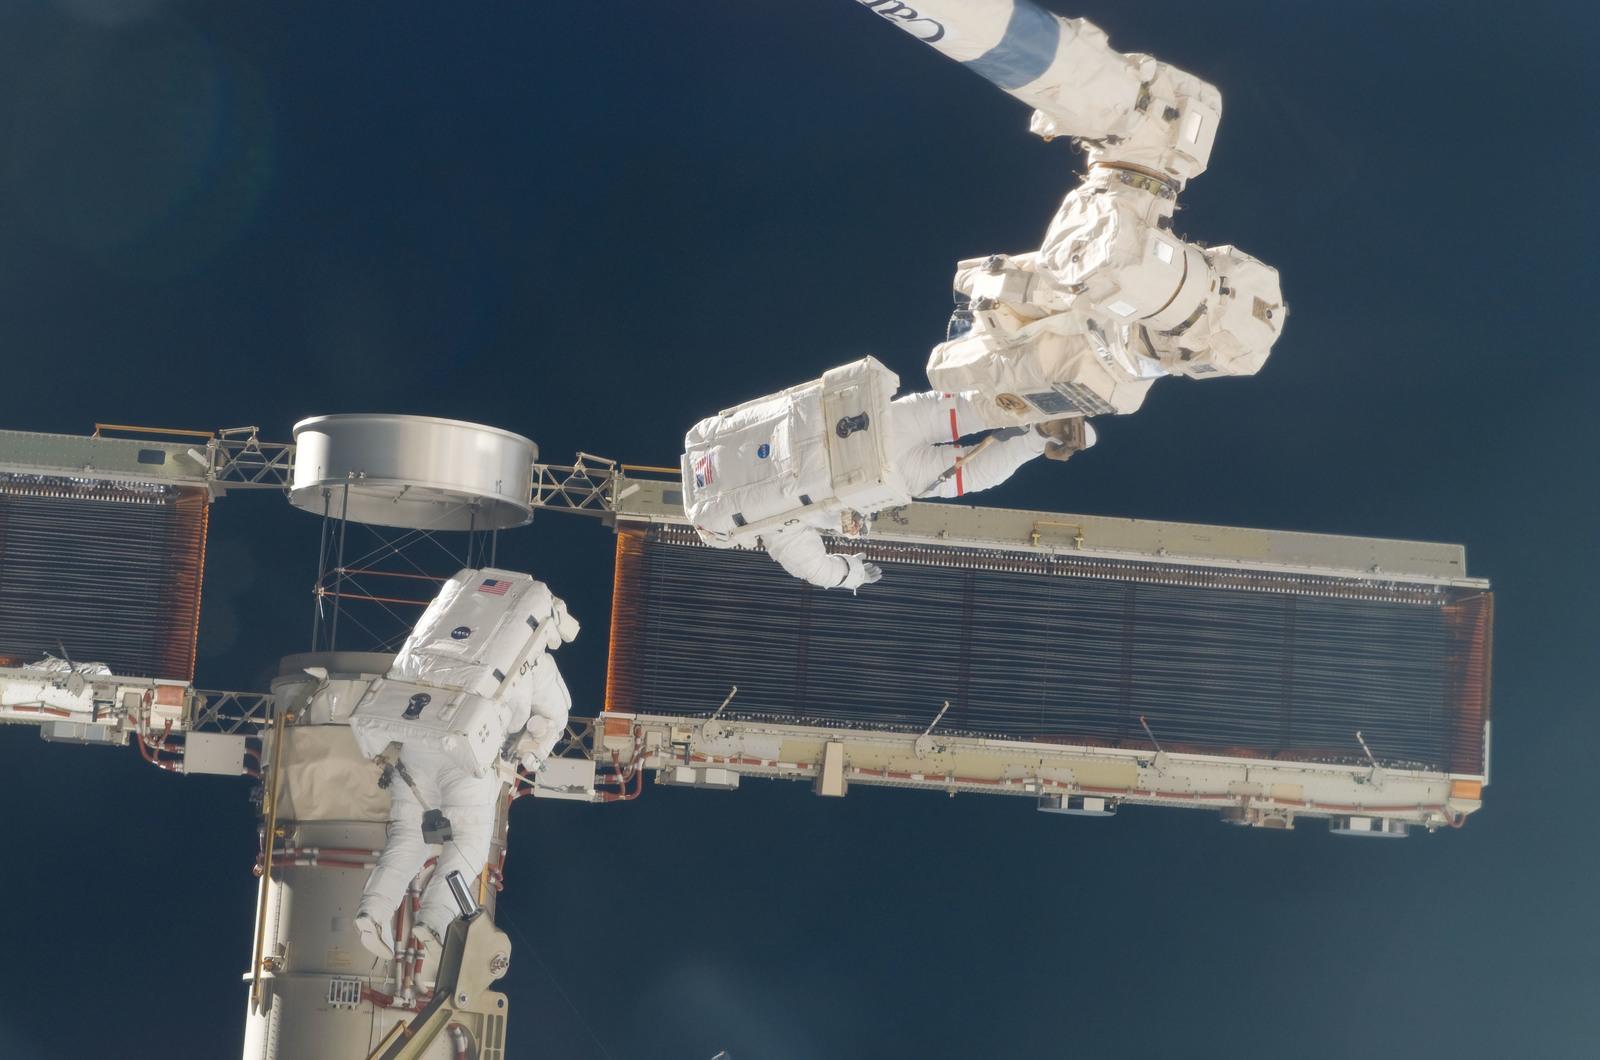 S116E06869 - STS-116 - STS-116 MS Fuglesang and Curbeam,Jr.,during EVA 4